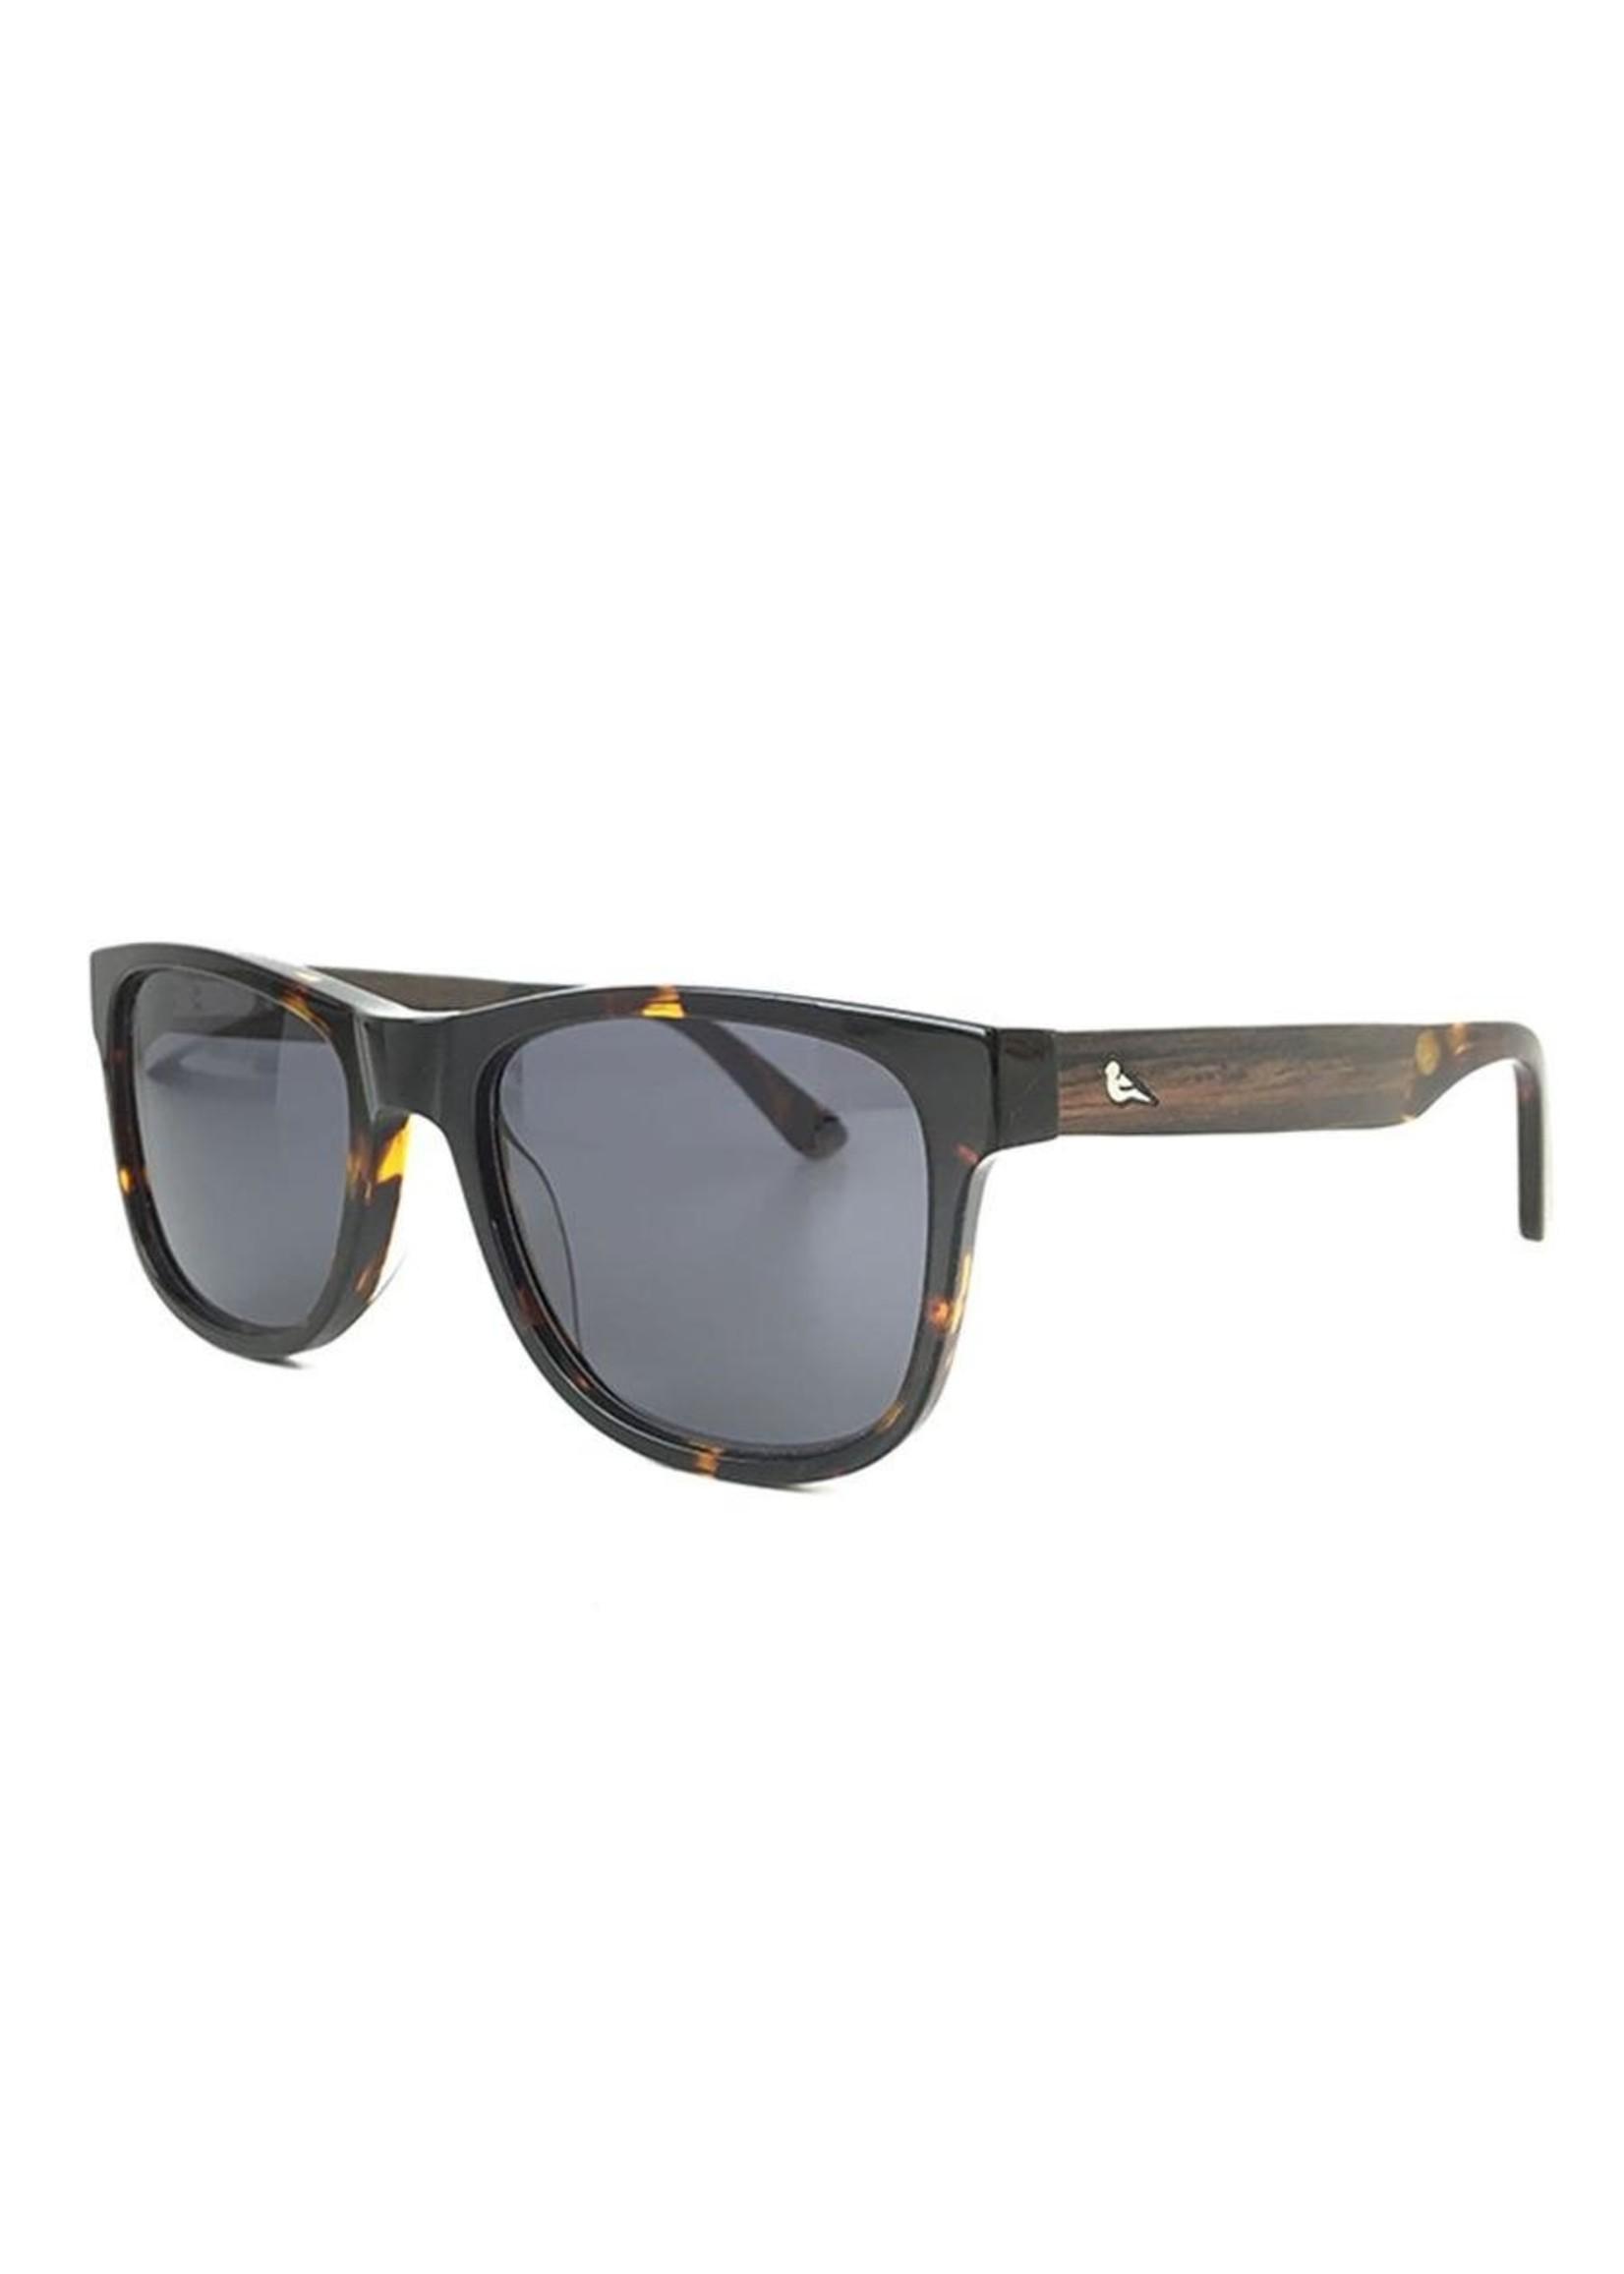 Bird Eyewear Bird Otus Sunglasses - Tortoiseshell